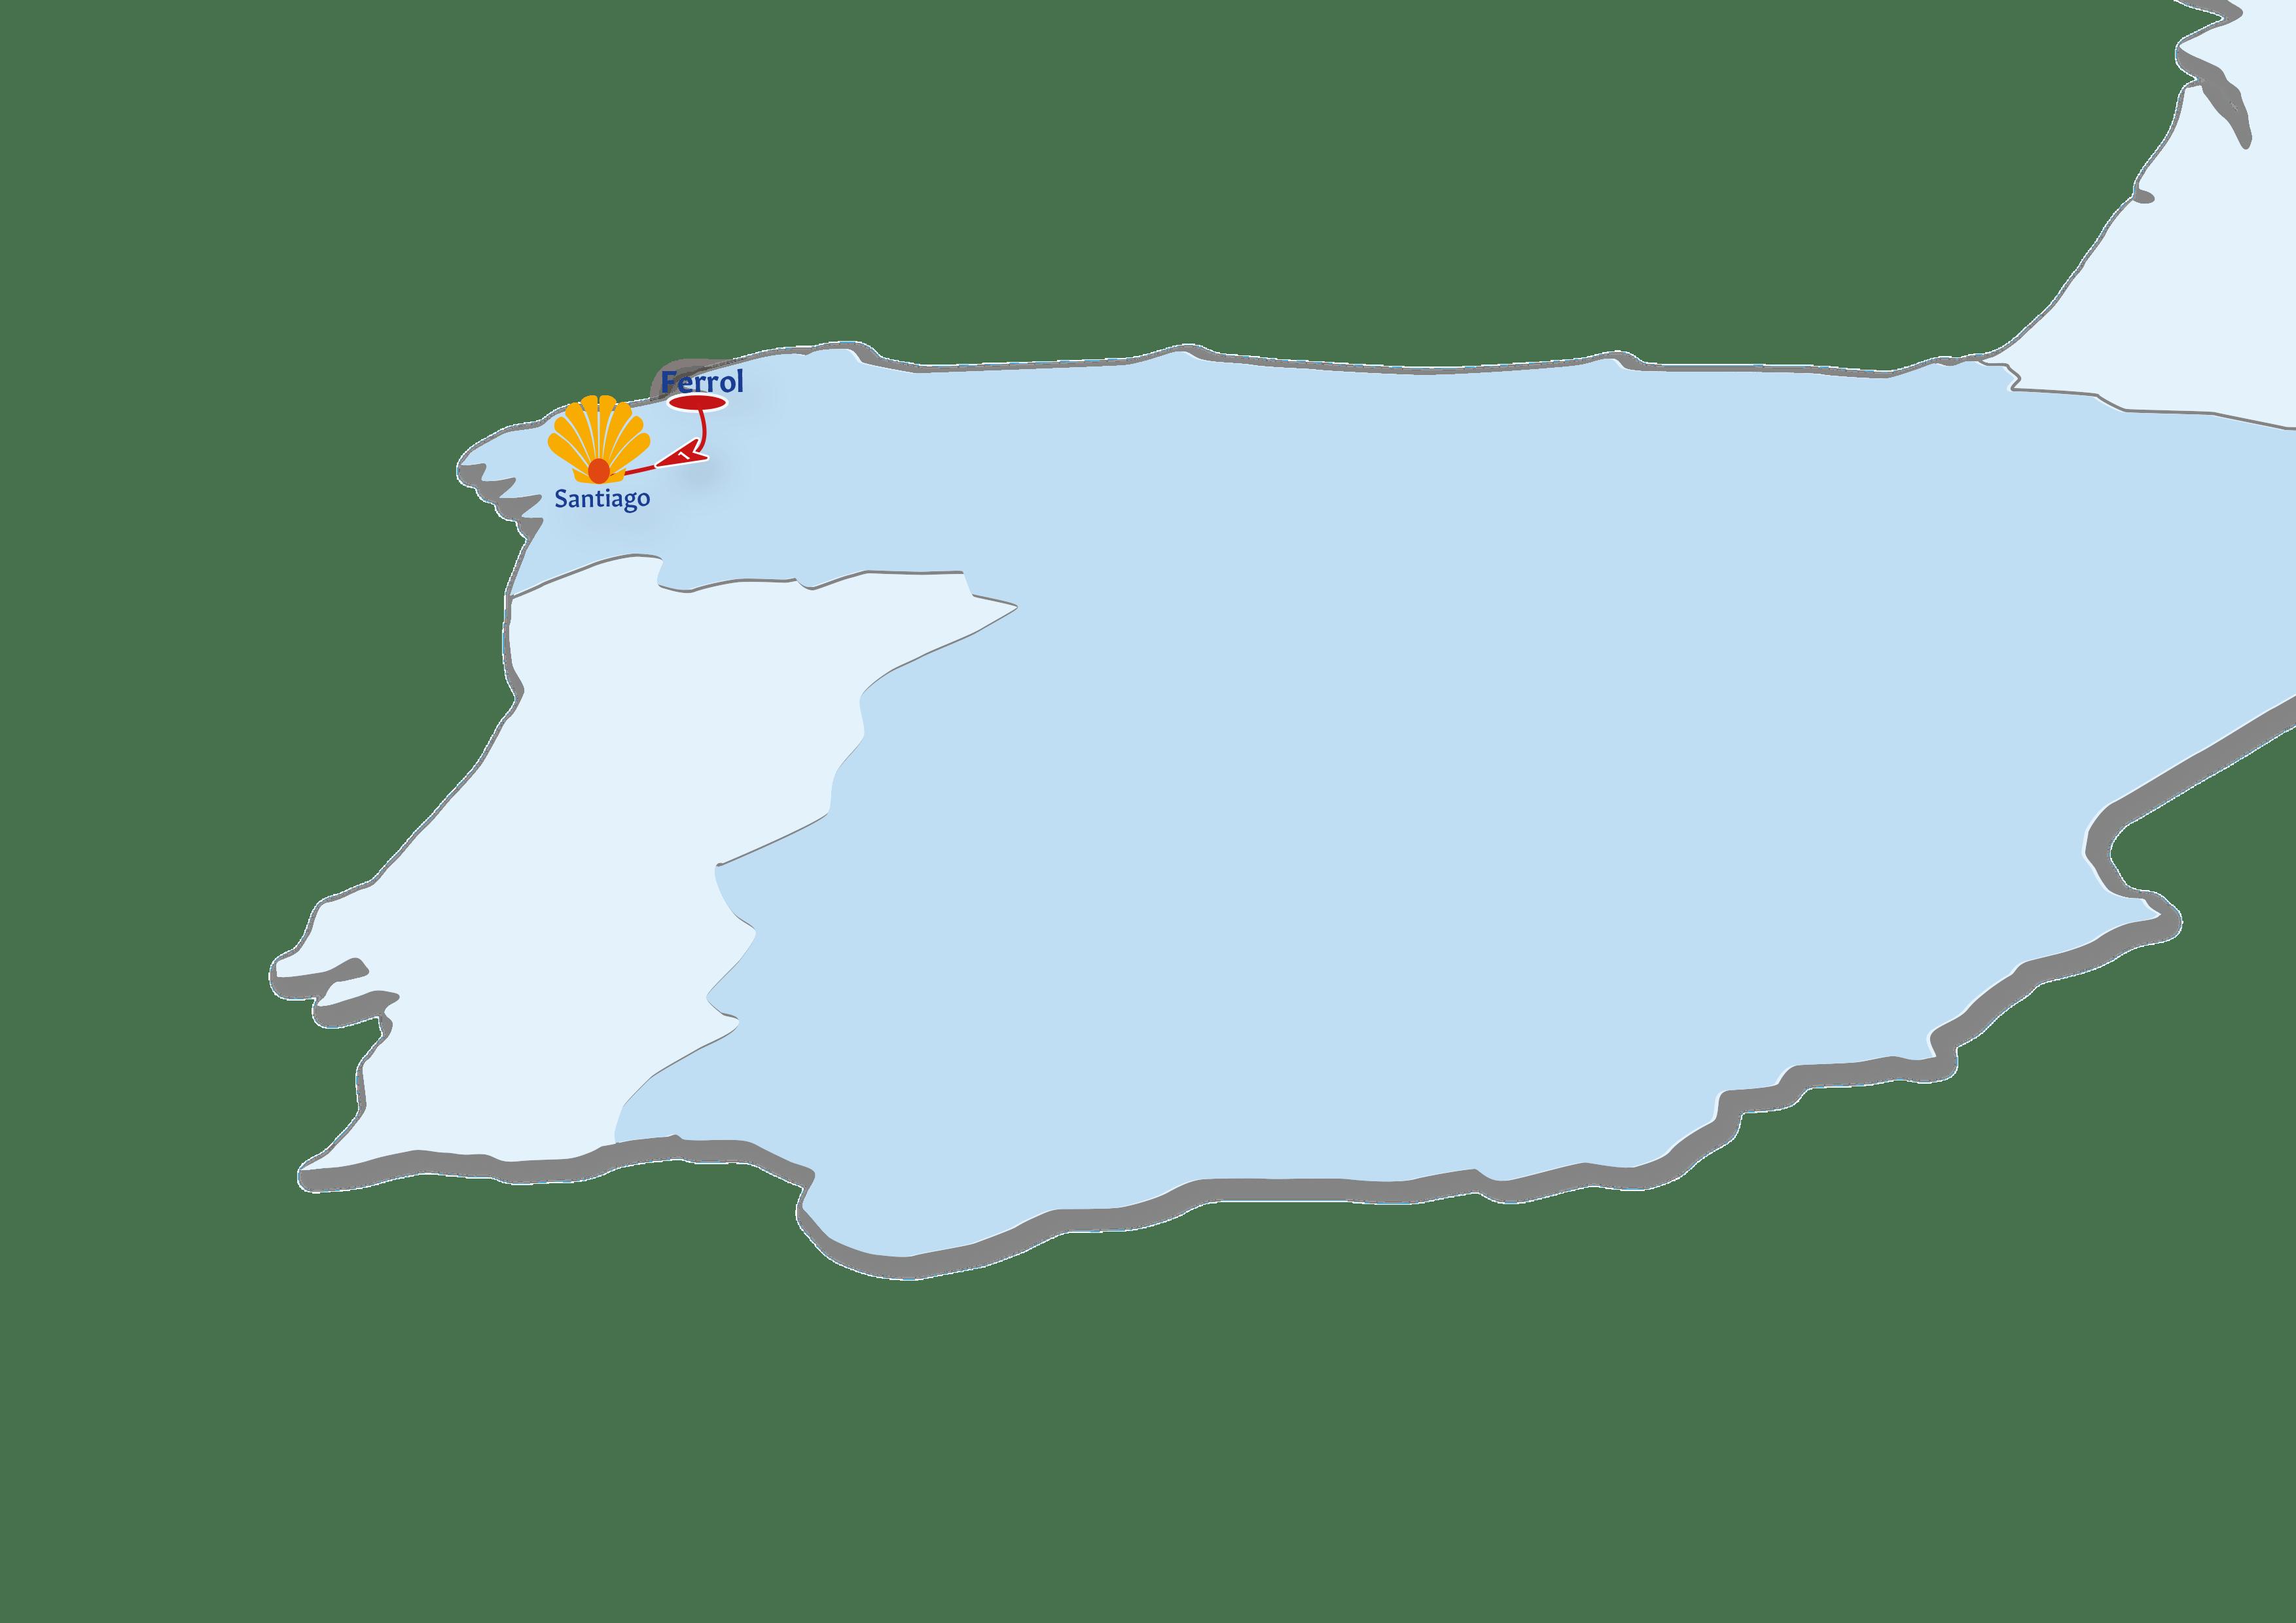 A map of the Camino de Ingles route